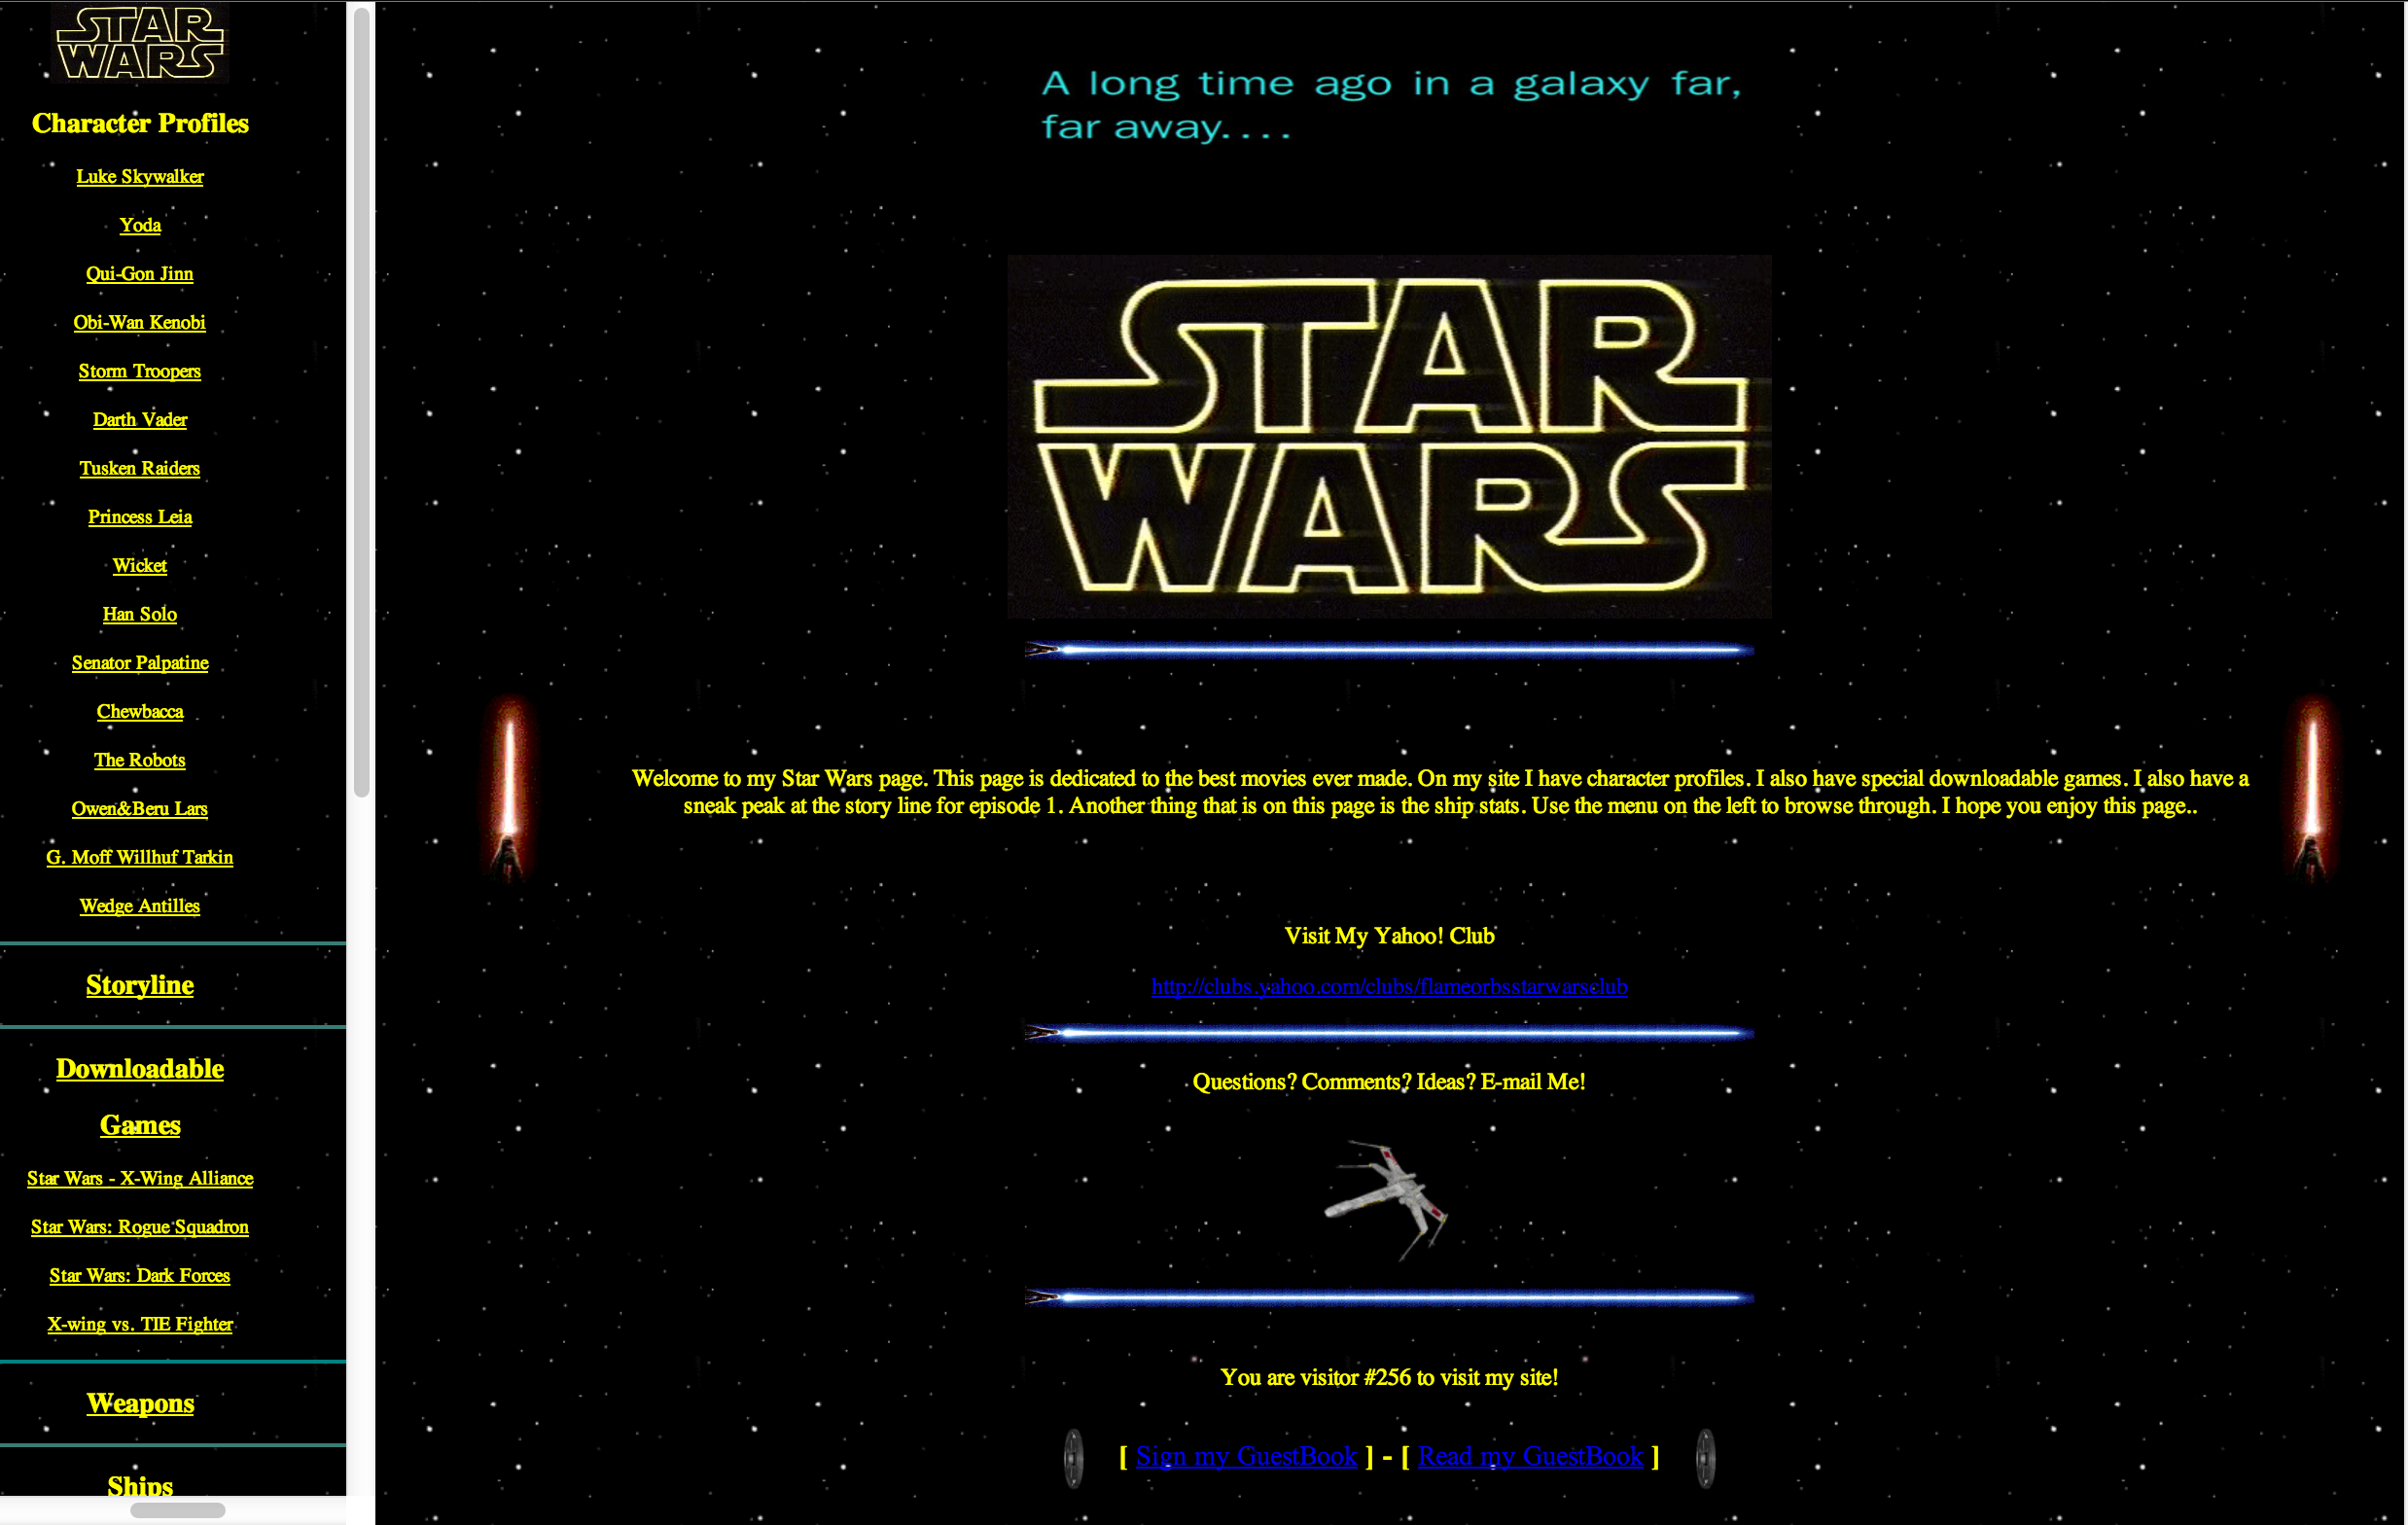 Star Wars Restoration: Home Page Finished